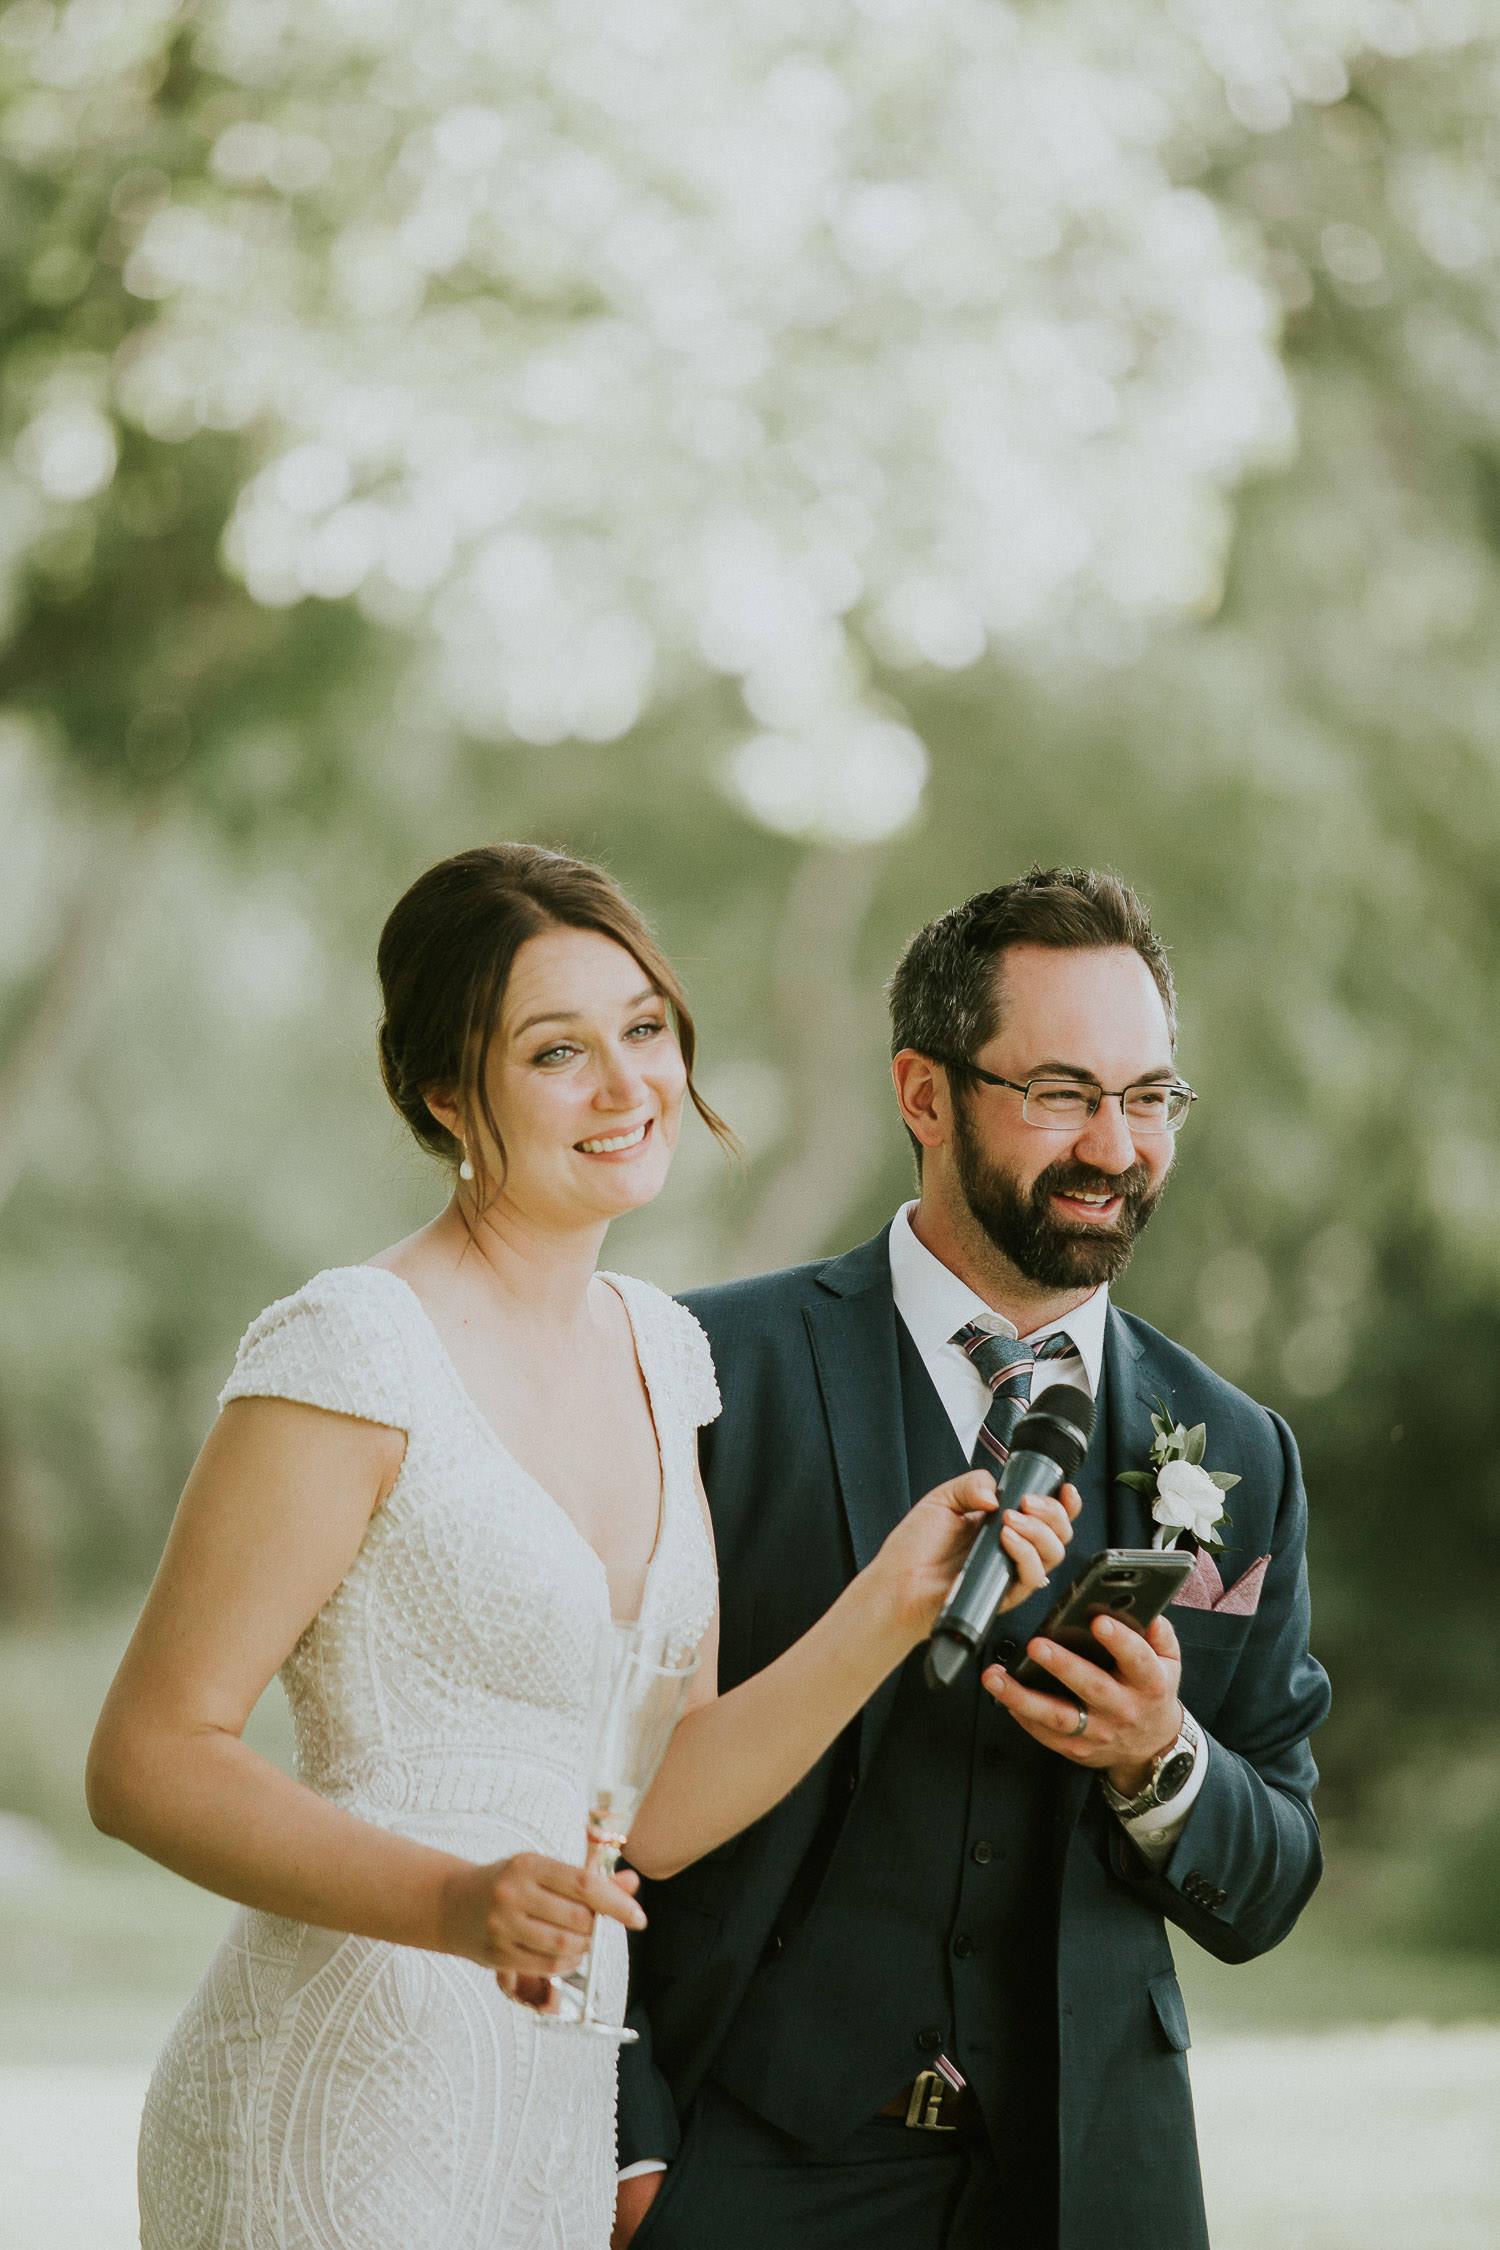 summer-backyard-wedding-in-alberta-sarah-pukin-0173